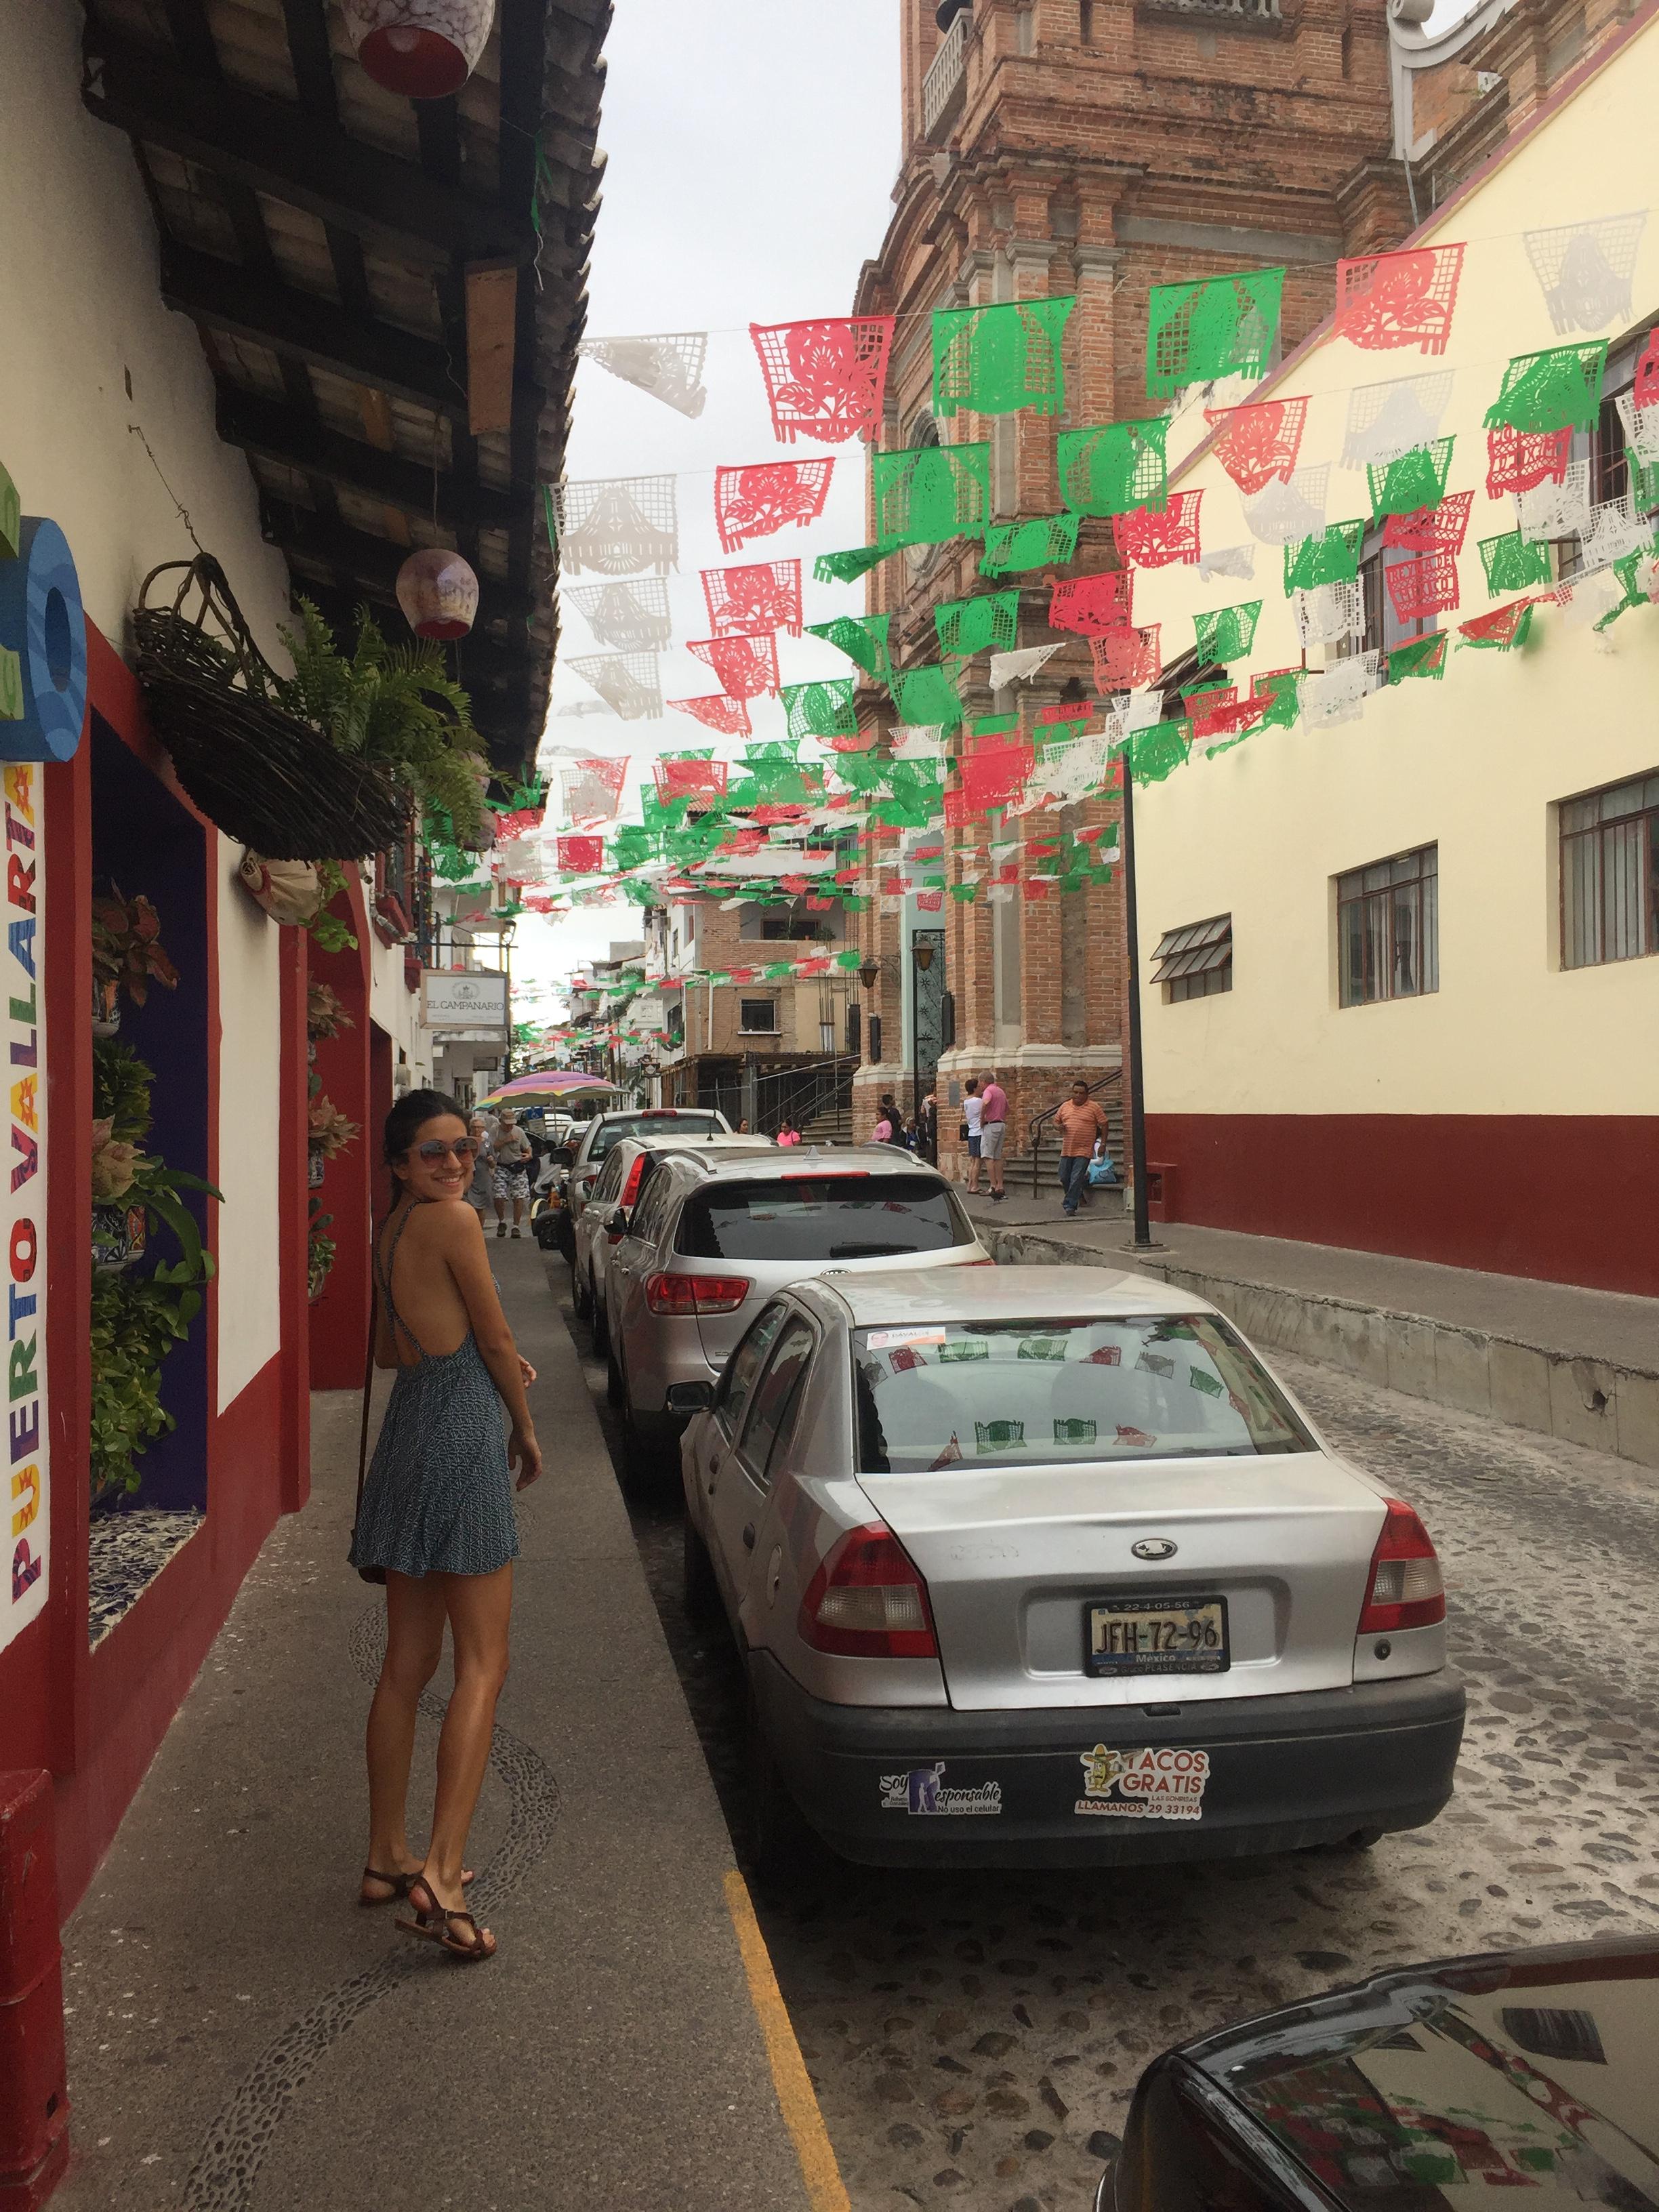 Walking down the cobblestone streets of old town Puerto Vallarta.